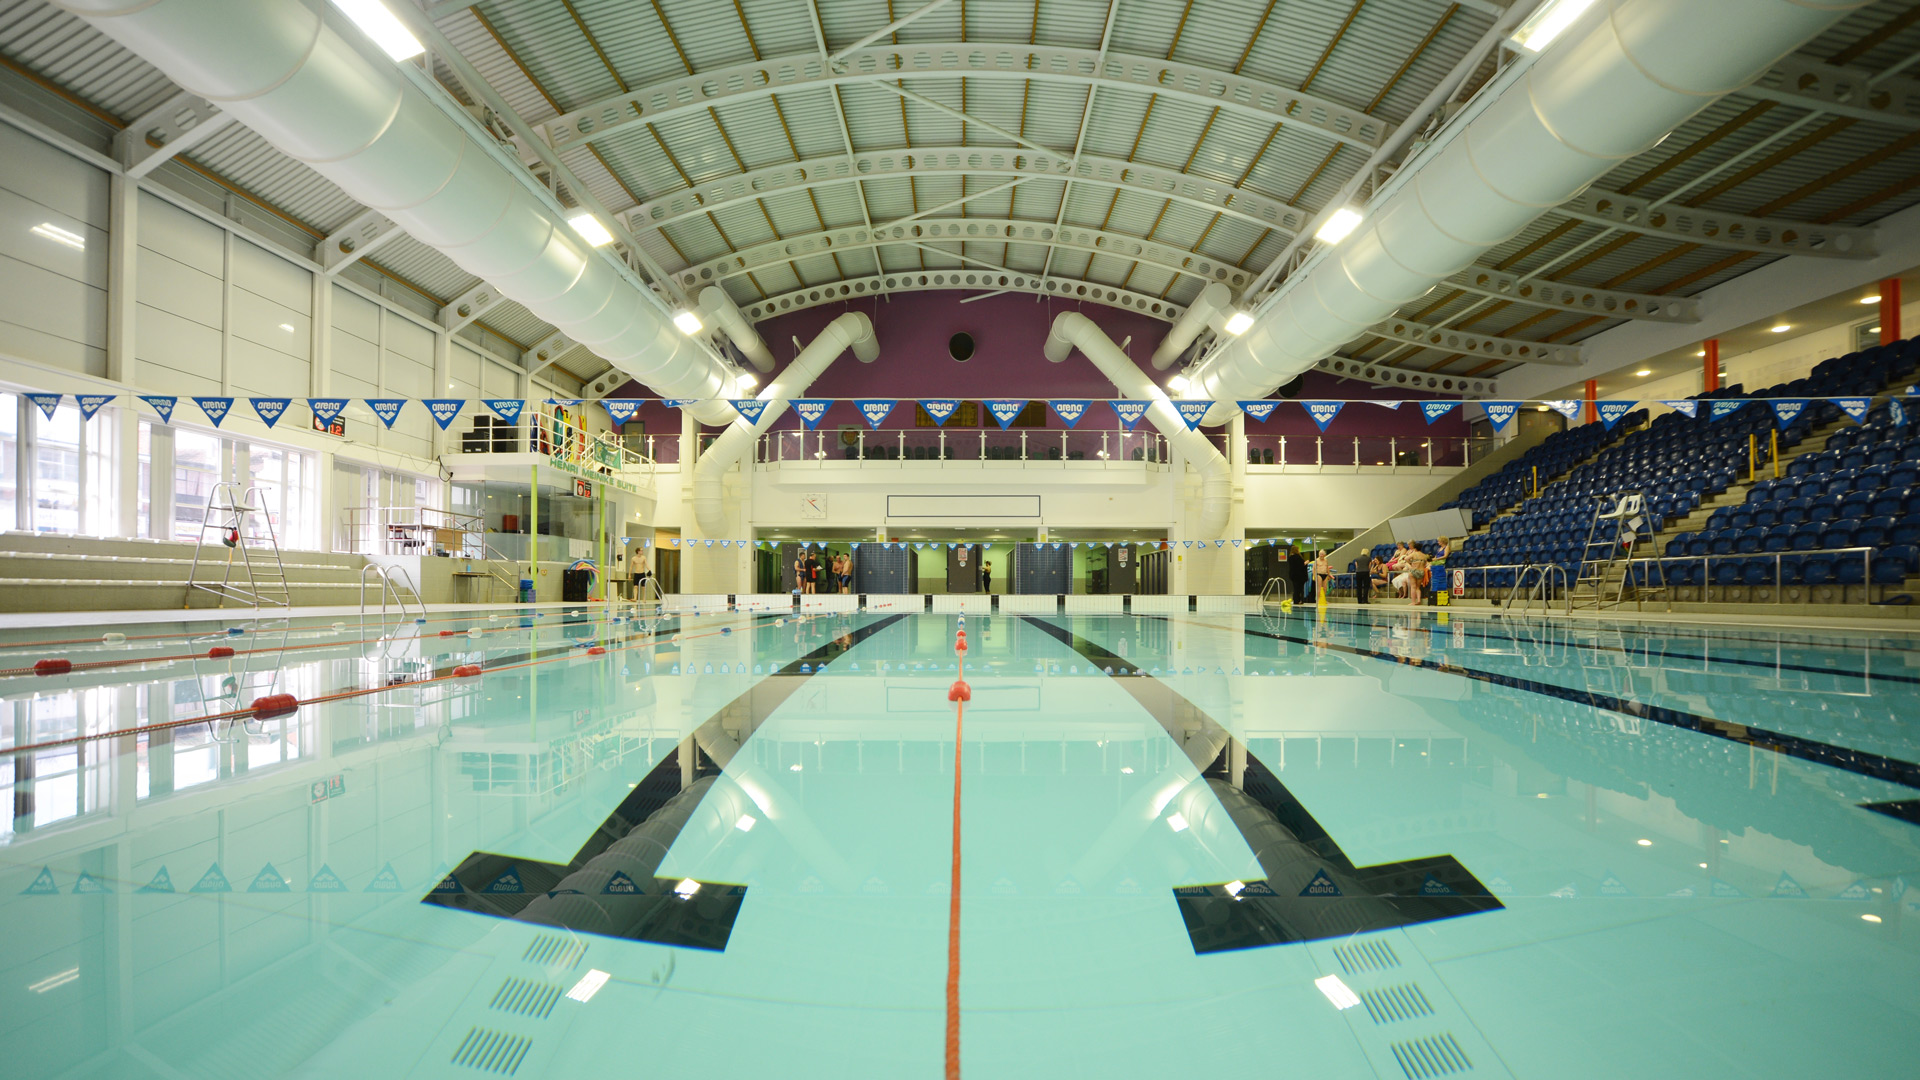 swimming pools gl1 gloucester aspire trust